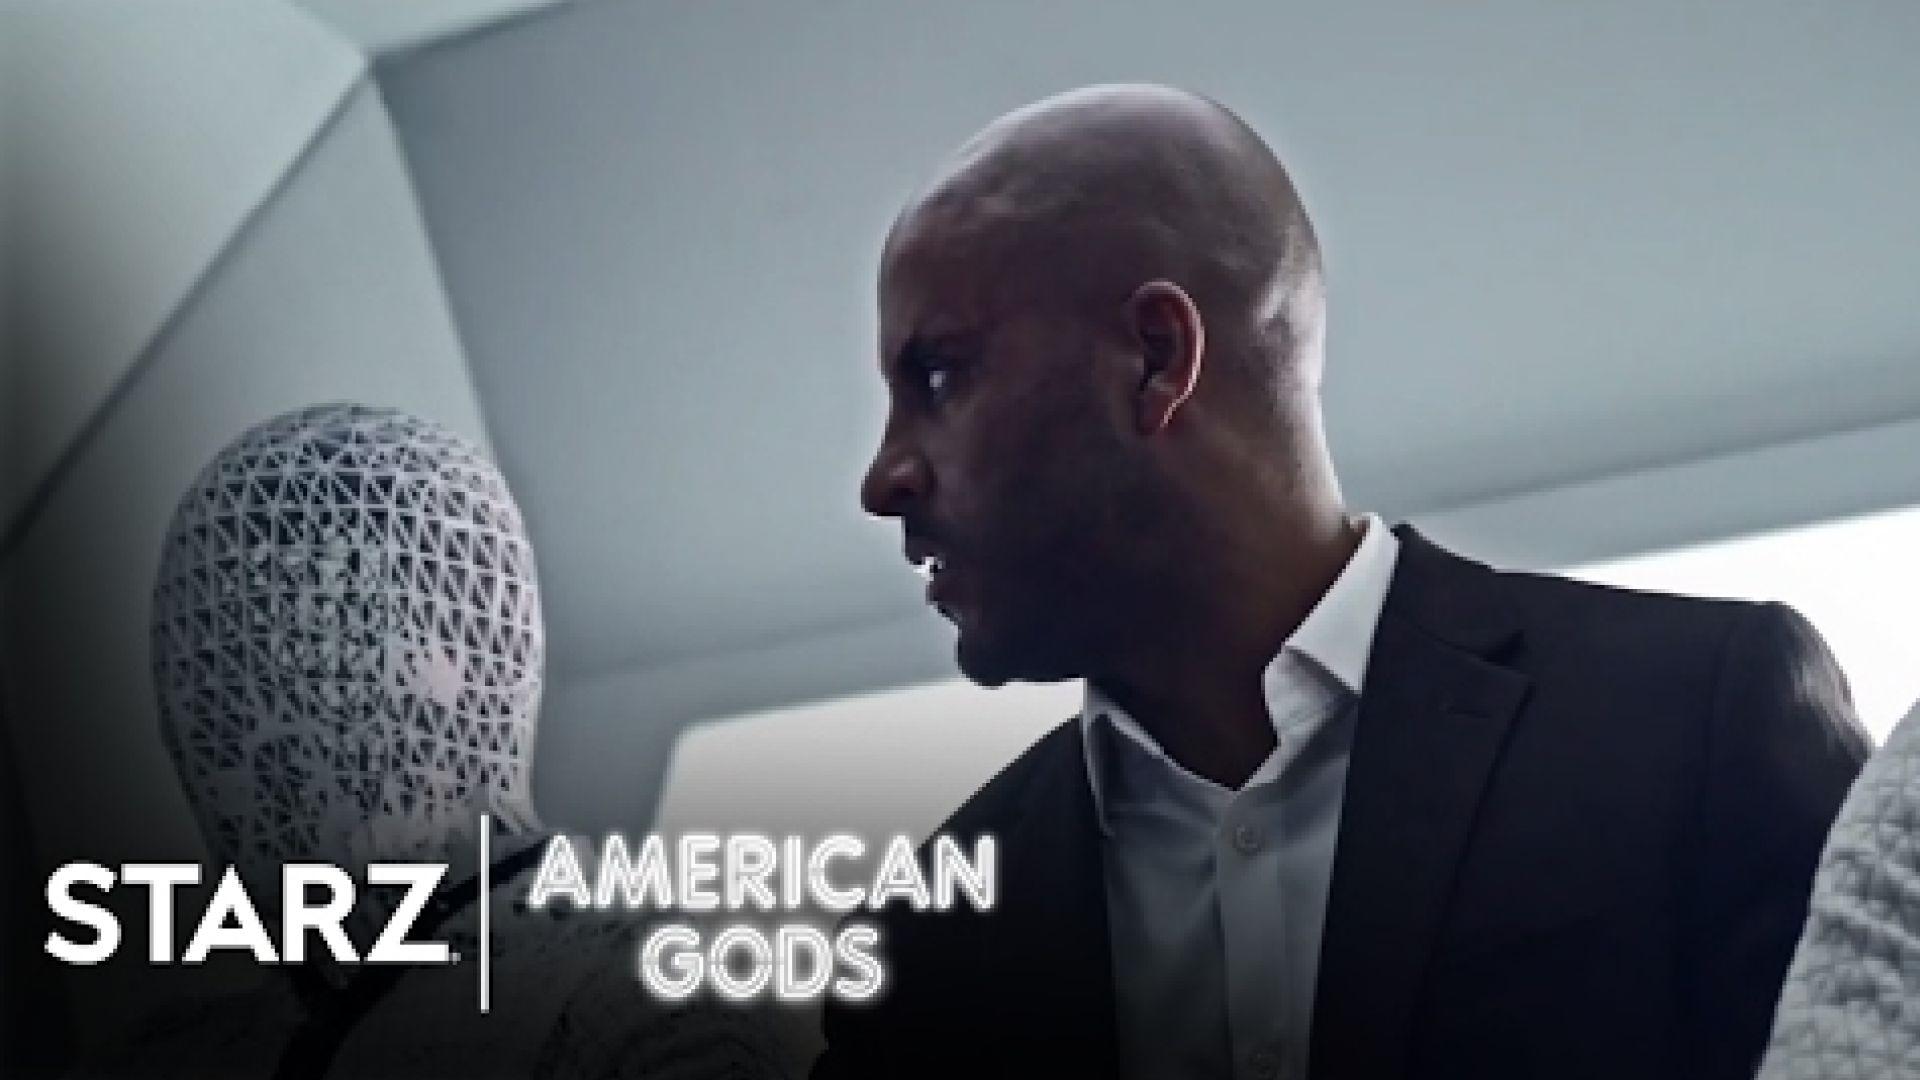 American Gods Show Moon Starz